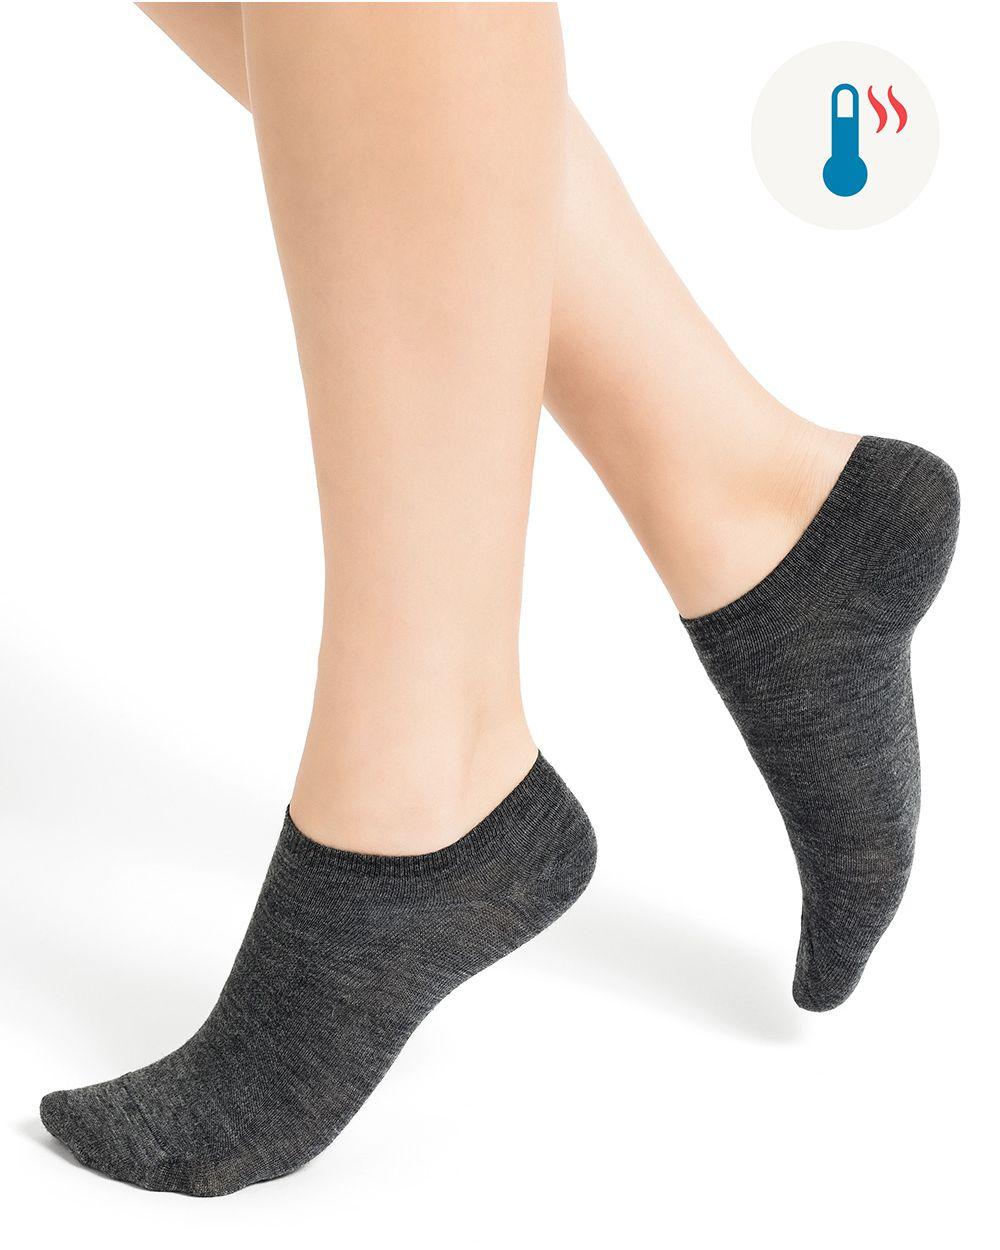 Socquettes laine fine unies